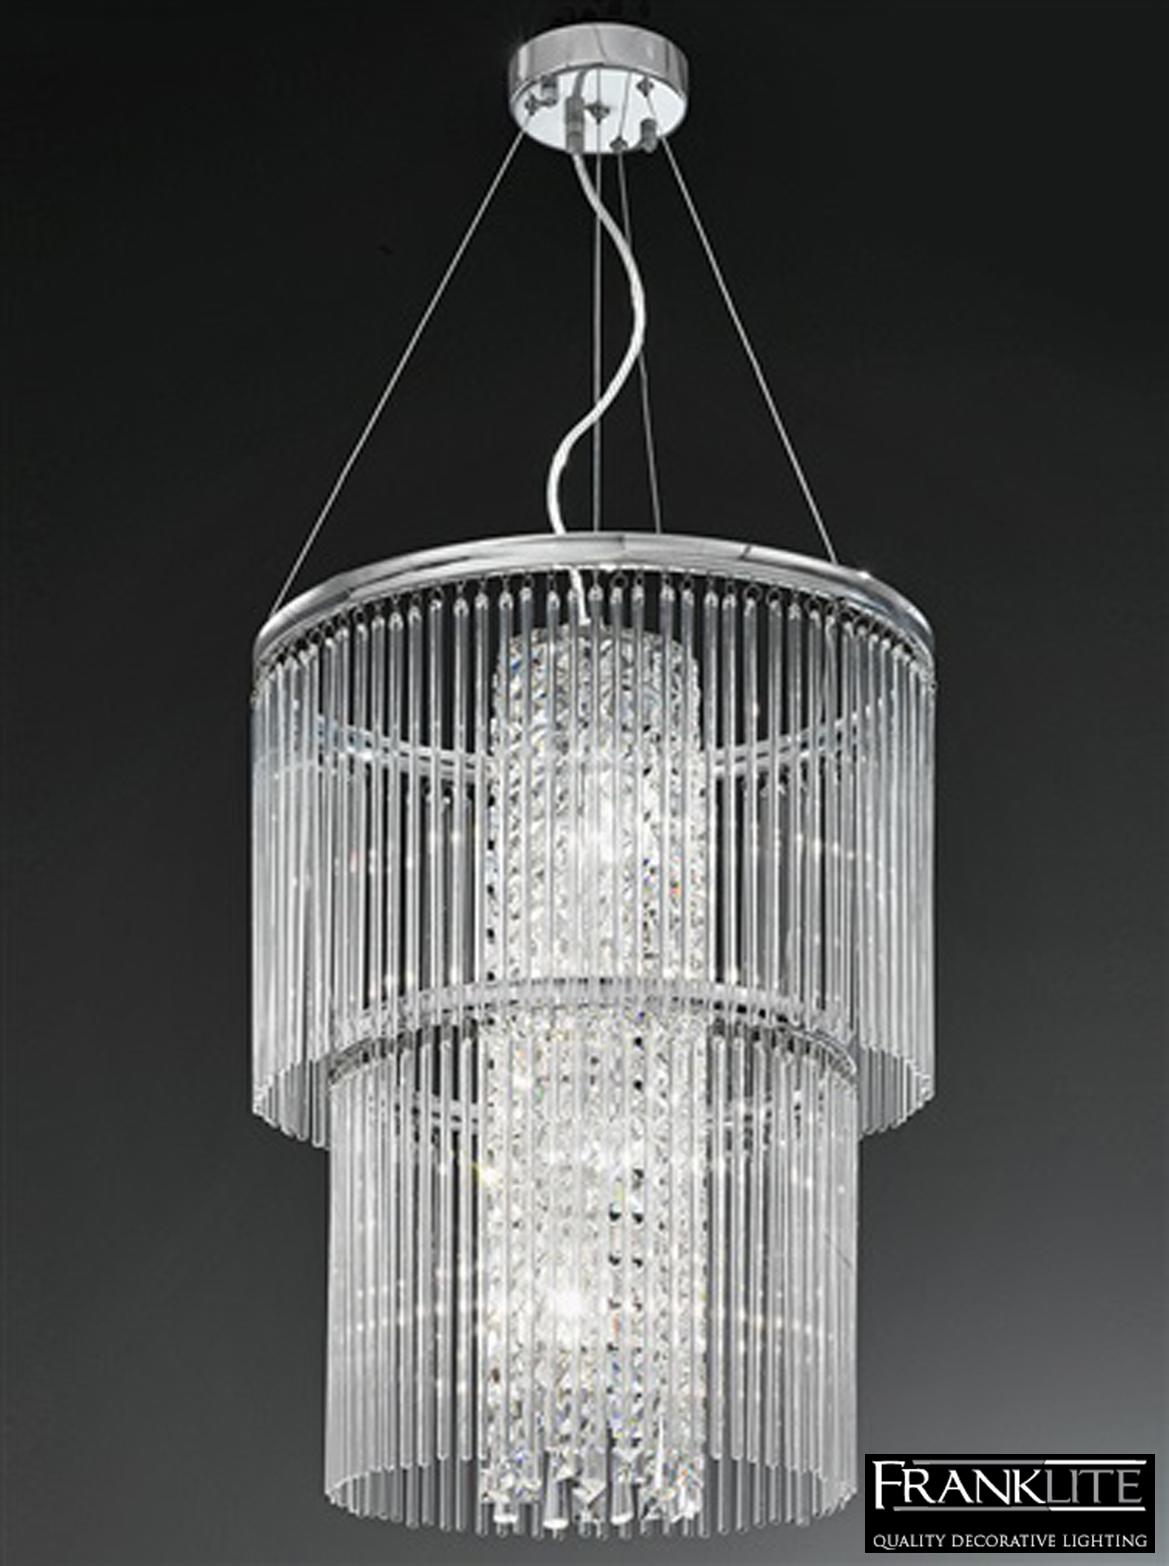 franklite charisma chrome crystal 4 light 2 tier pendant ceiling